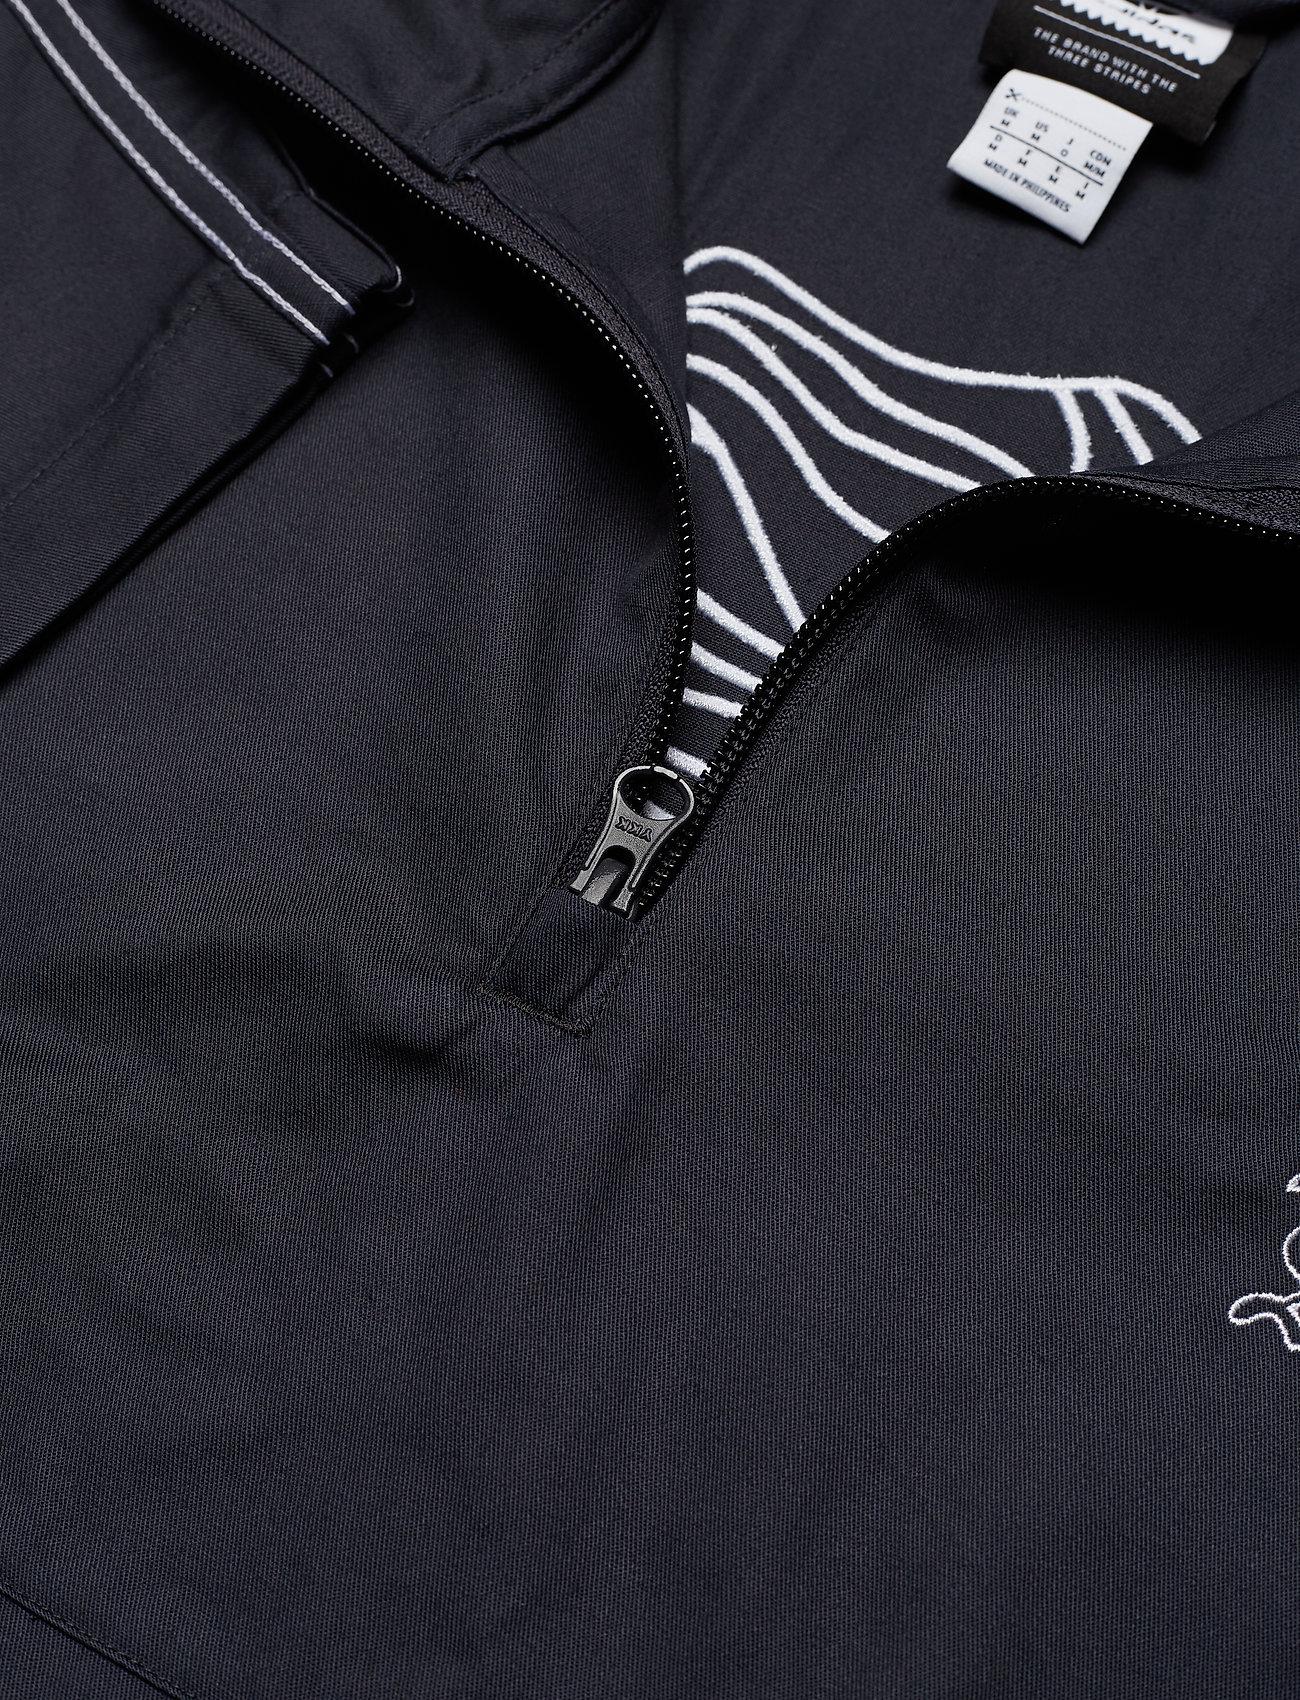 Adidas Performance Manolesjacket - Jackor & Rockar Ntgrey/white